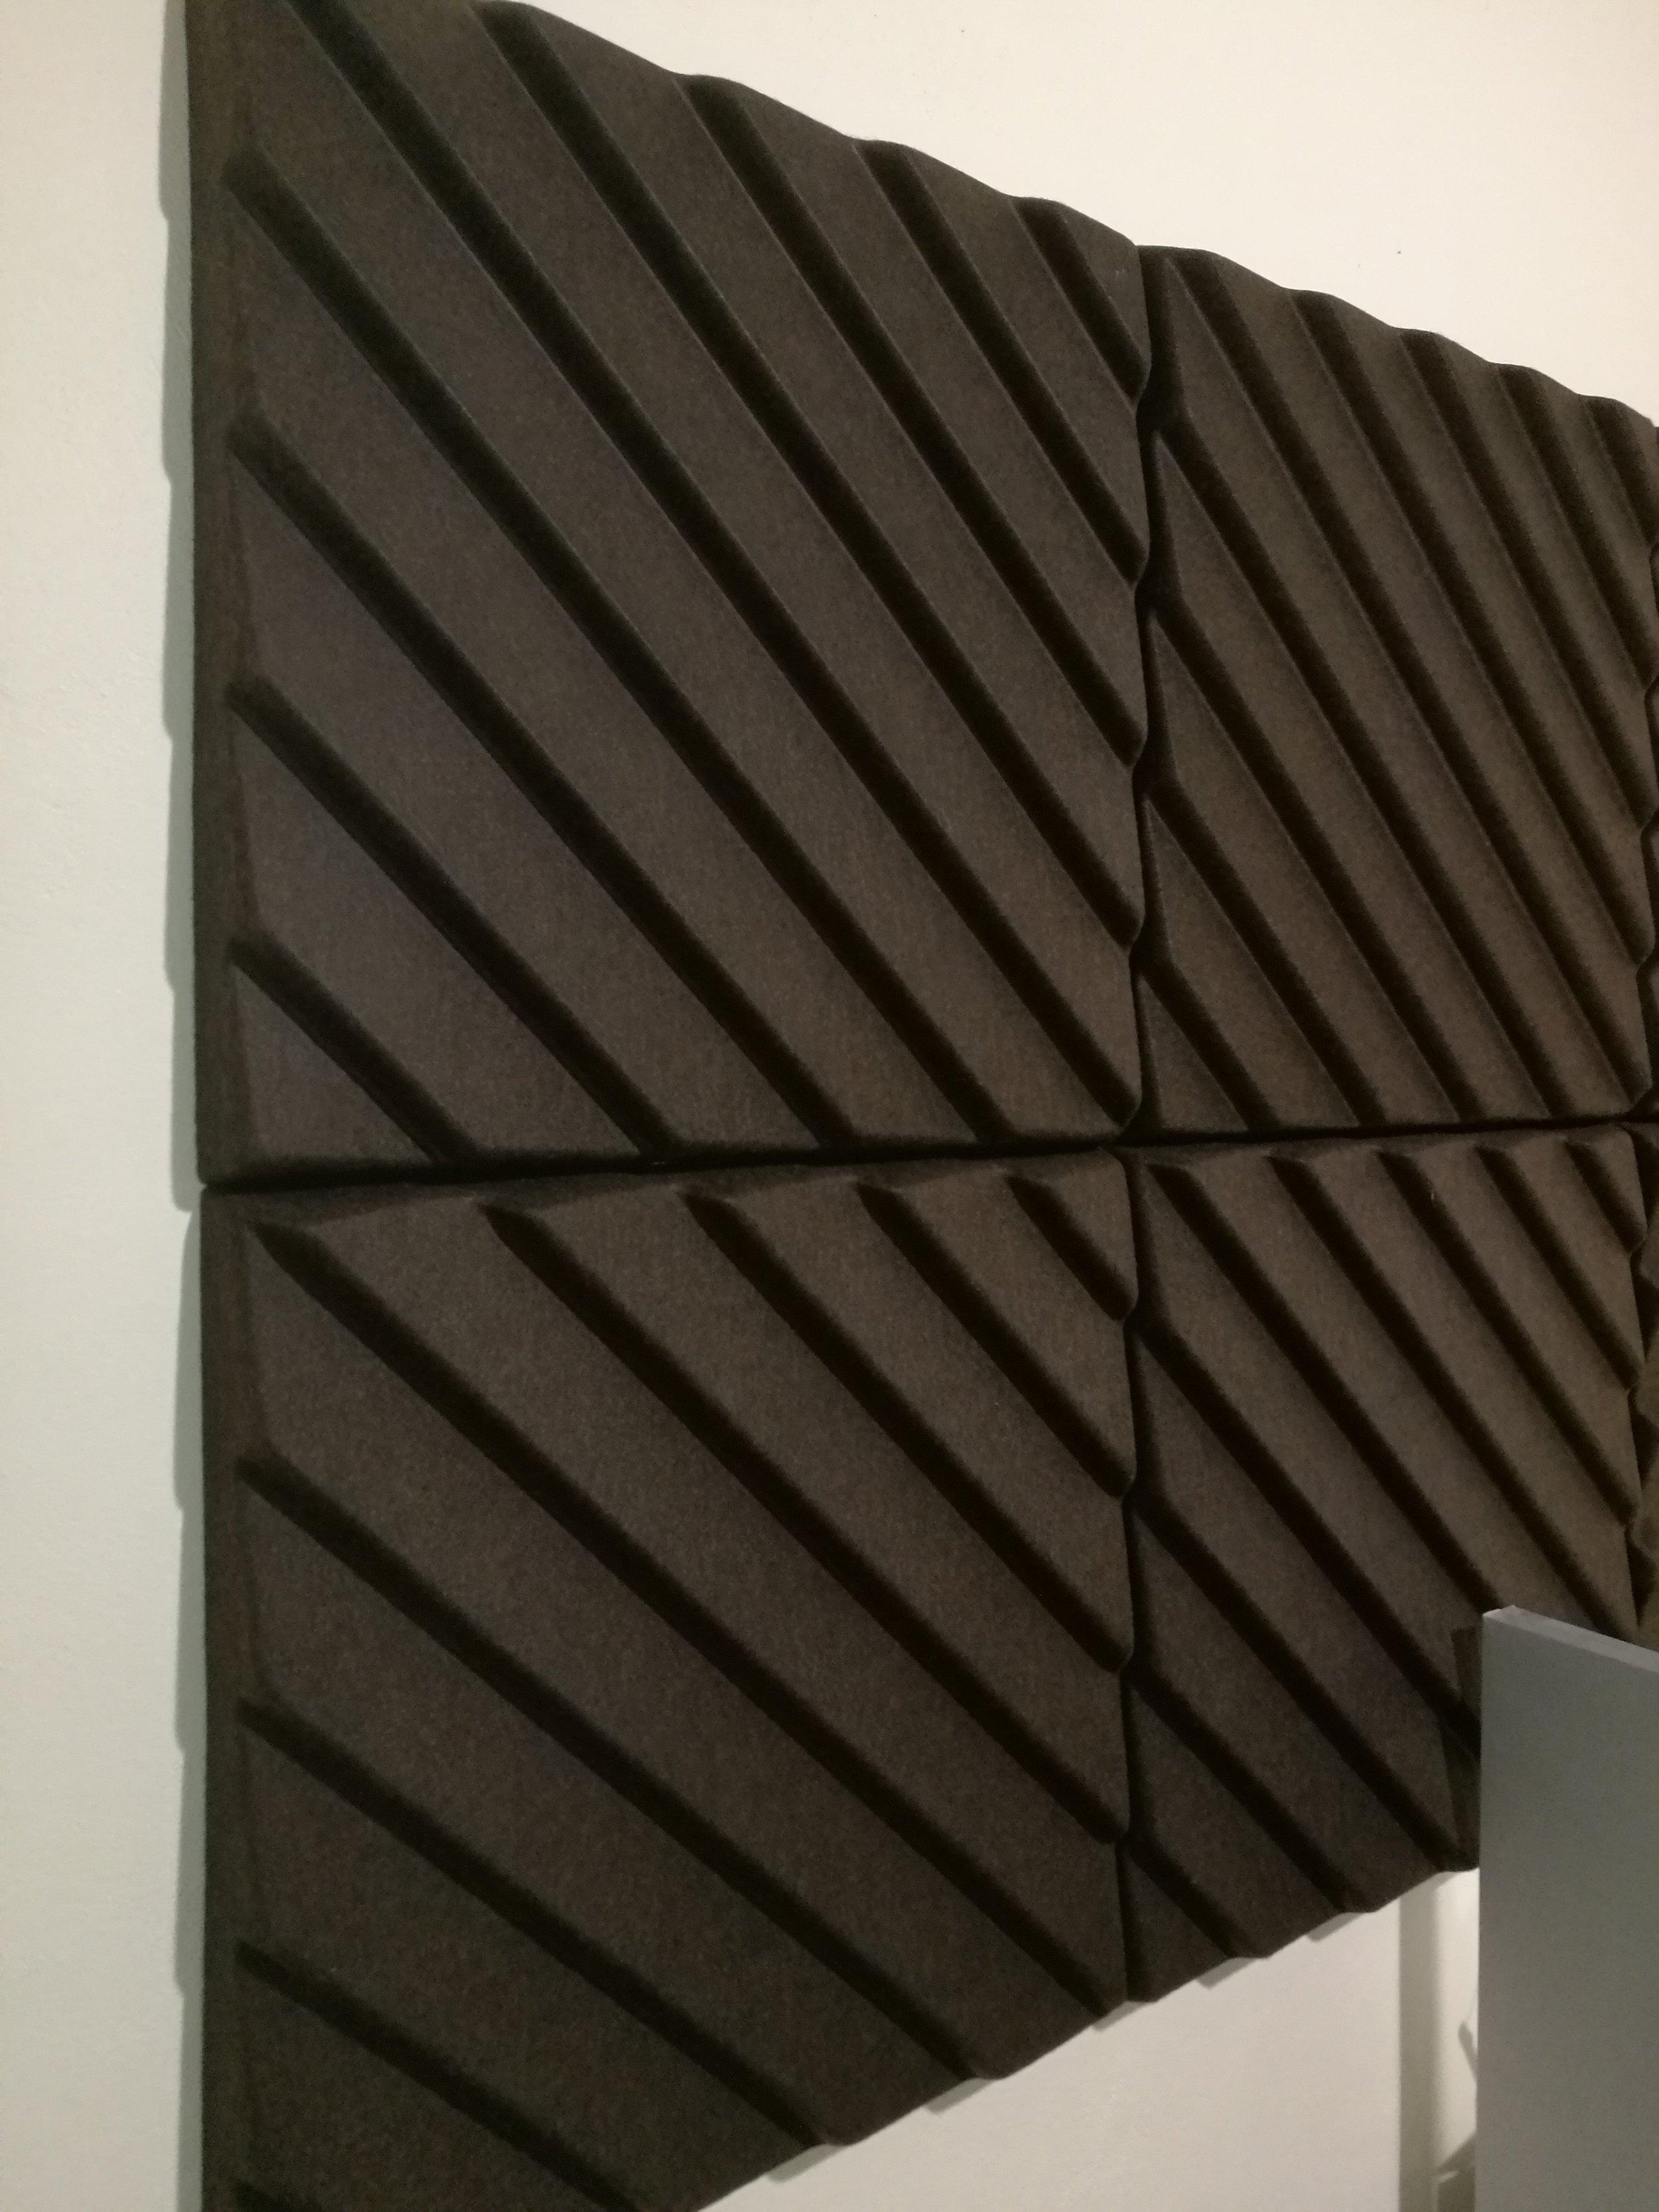 SOUNDWAVE STRIPES (10 stk)   Formpresset polYesterfiber i brun Førpris NOK 801 eks mva pr. stk  Nåpris NOK 200 eks. mva  pr. stk